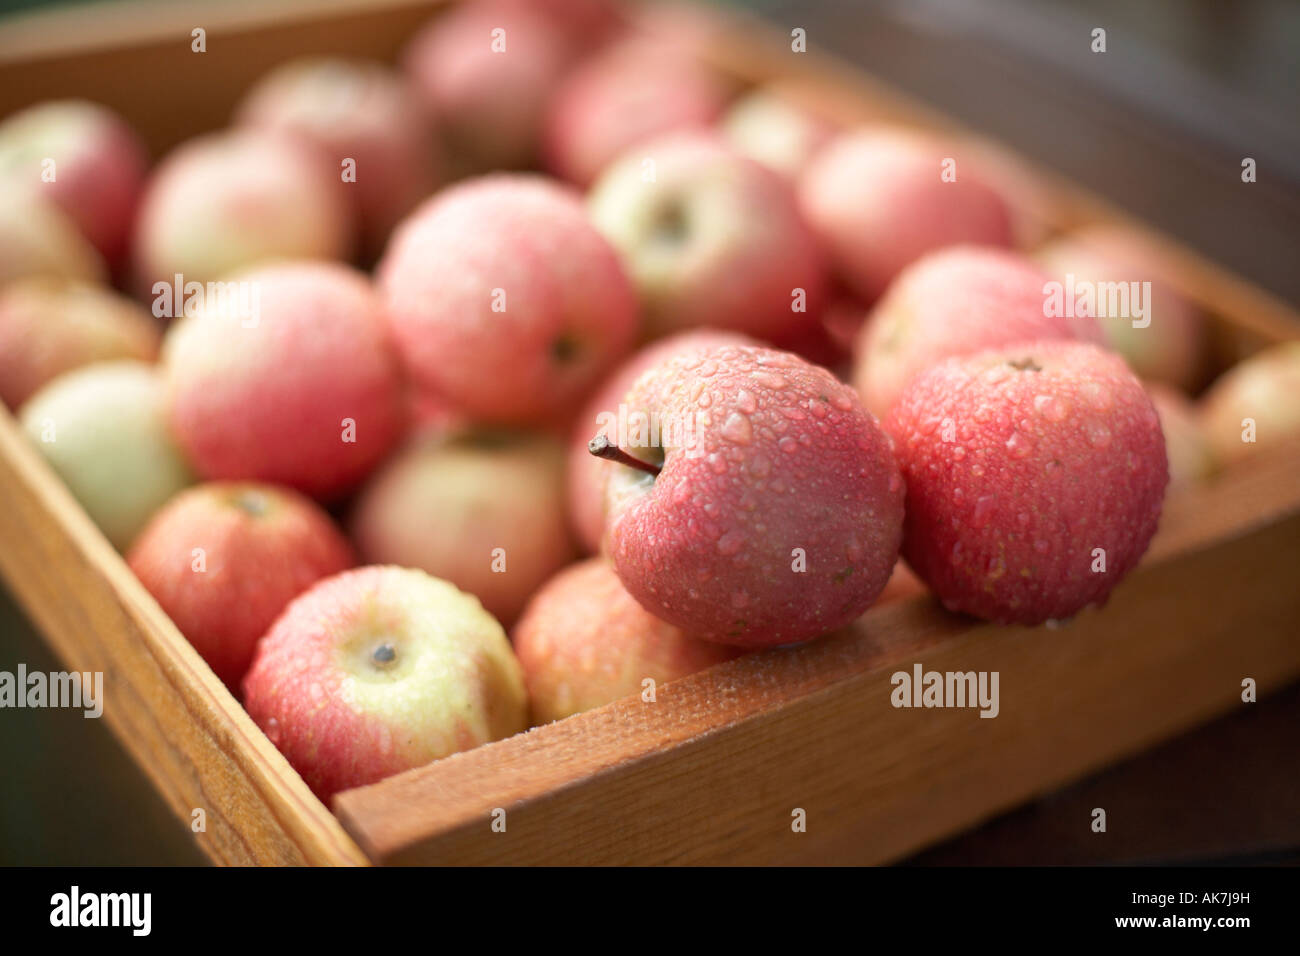 Box of Apples on an Organic Farm - Stock Image